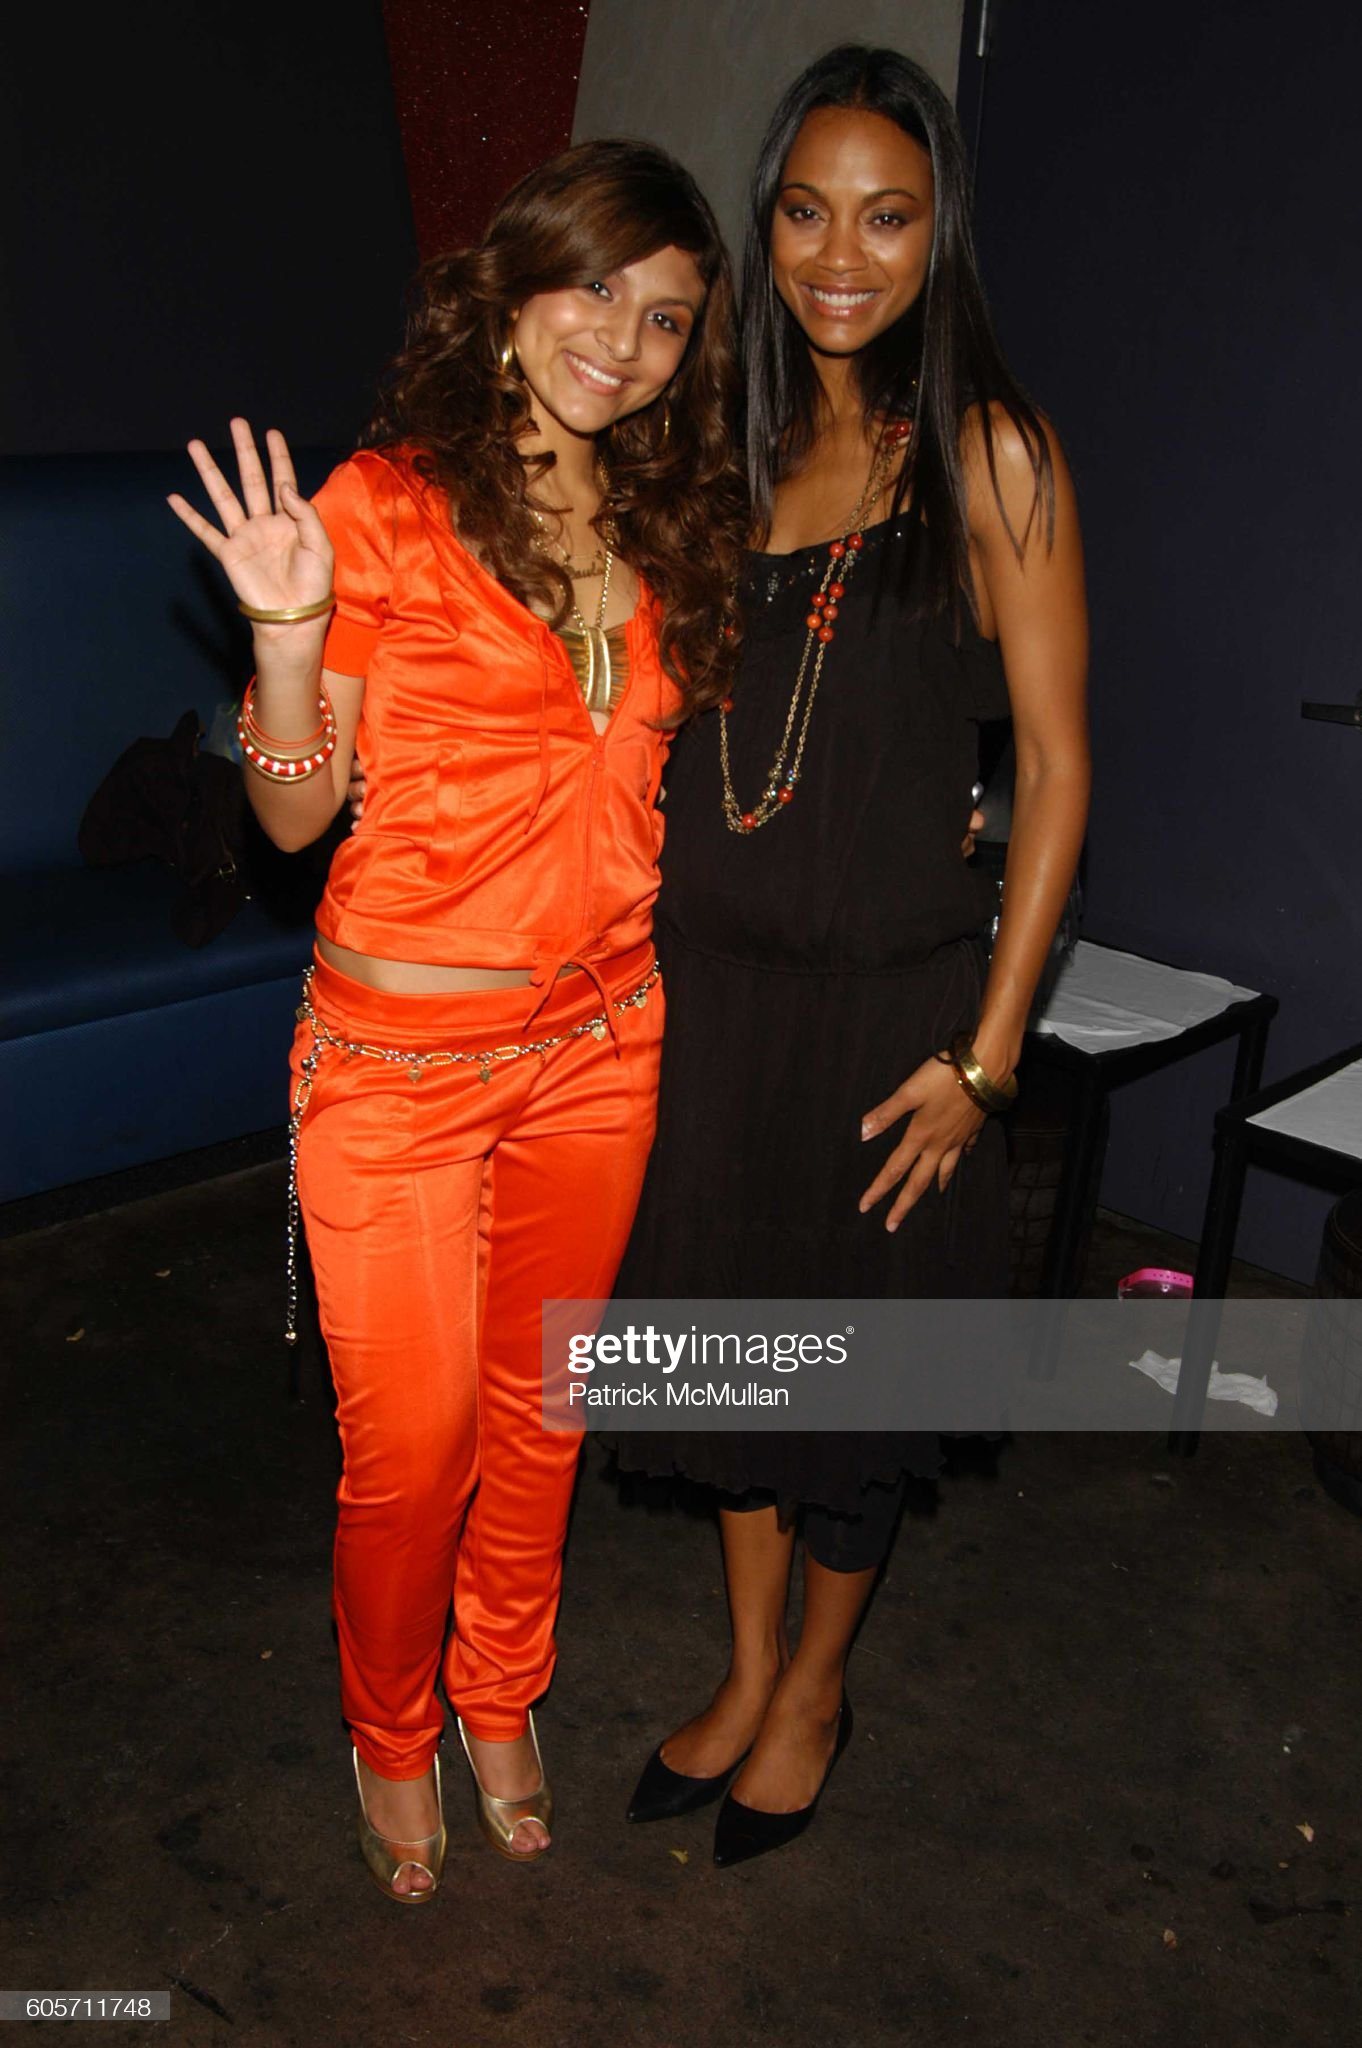 ¿Cuánto mide Paula DeAnda? - Altura - Real height Paula-deanda-and-zoe-saldana-attend-ny-international-latin-film-by-picture-id605711748?s=2048x2048